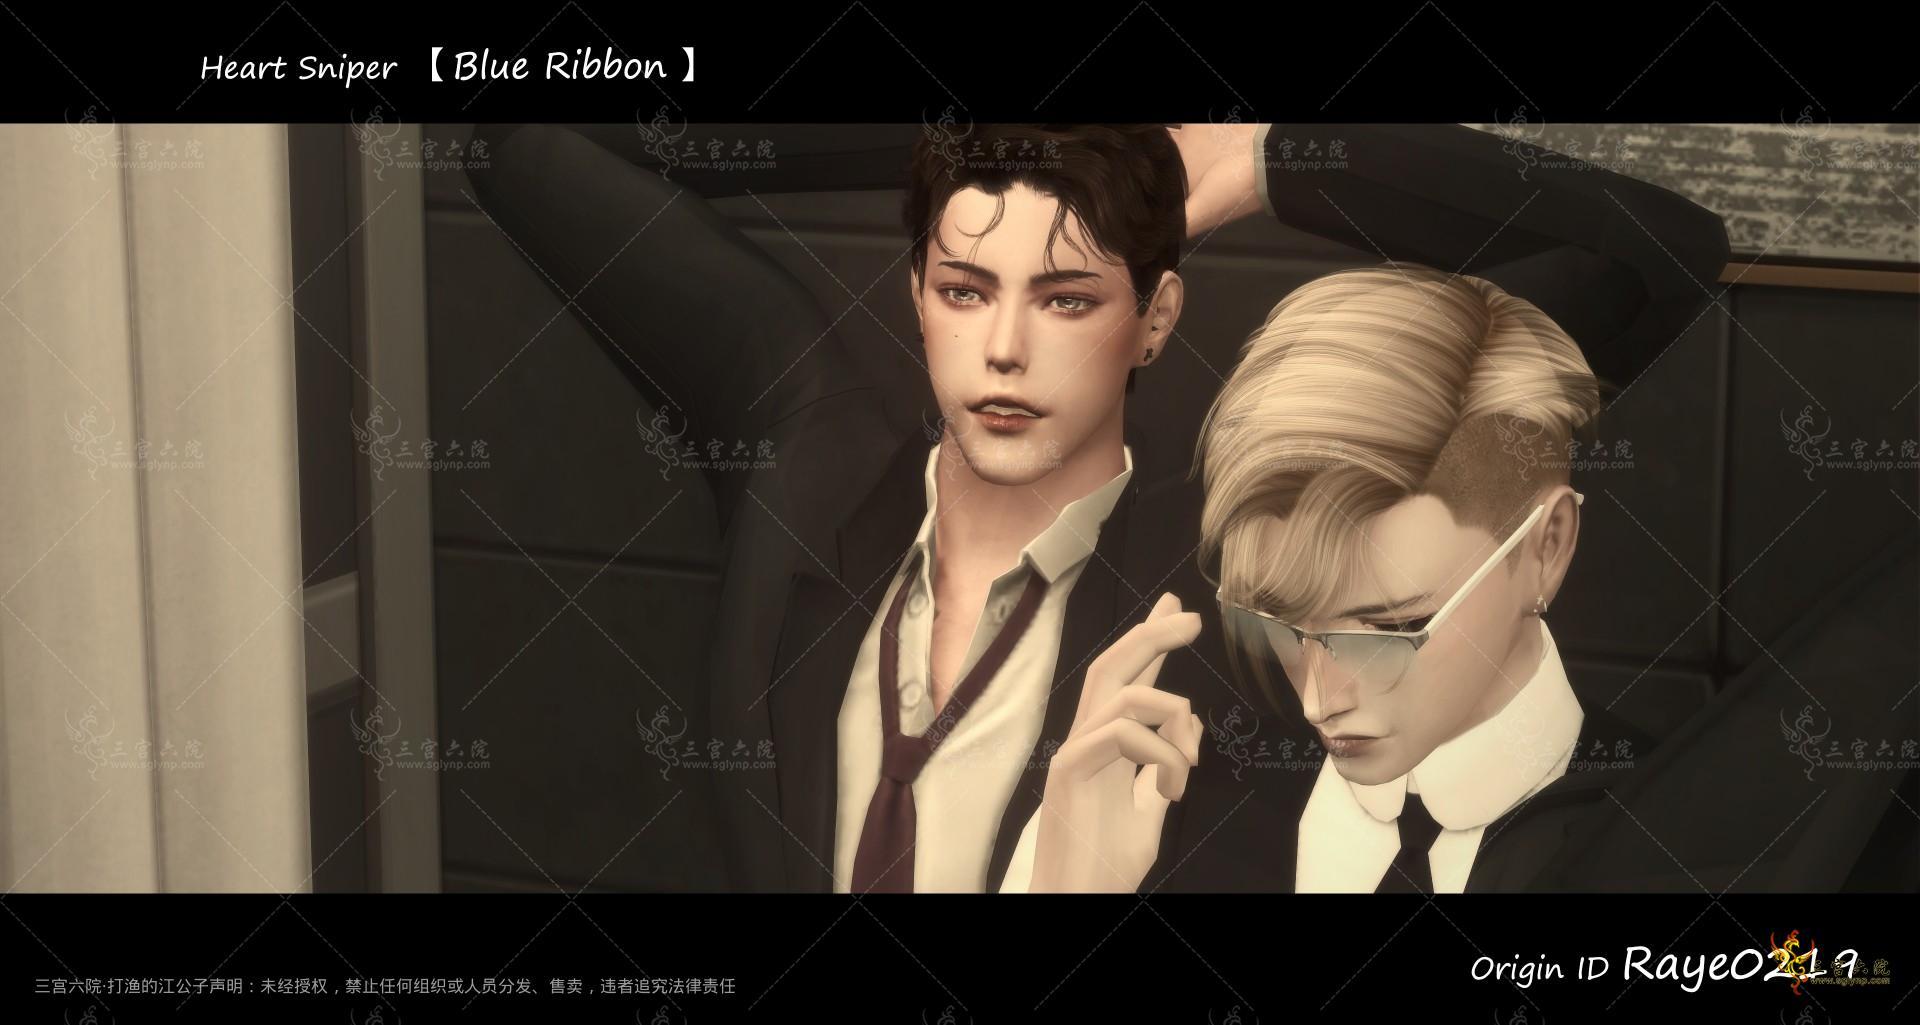 HS III [BLUE RIBBON] 05.png